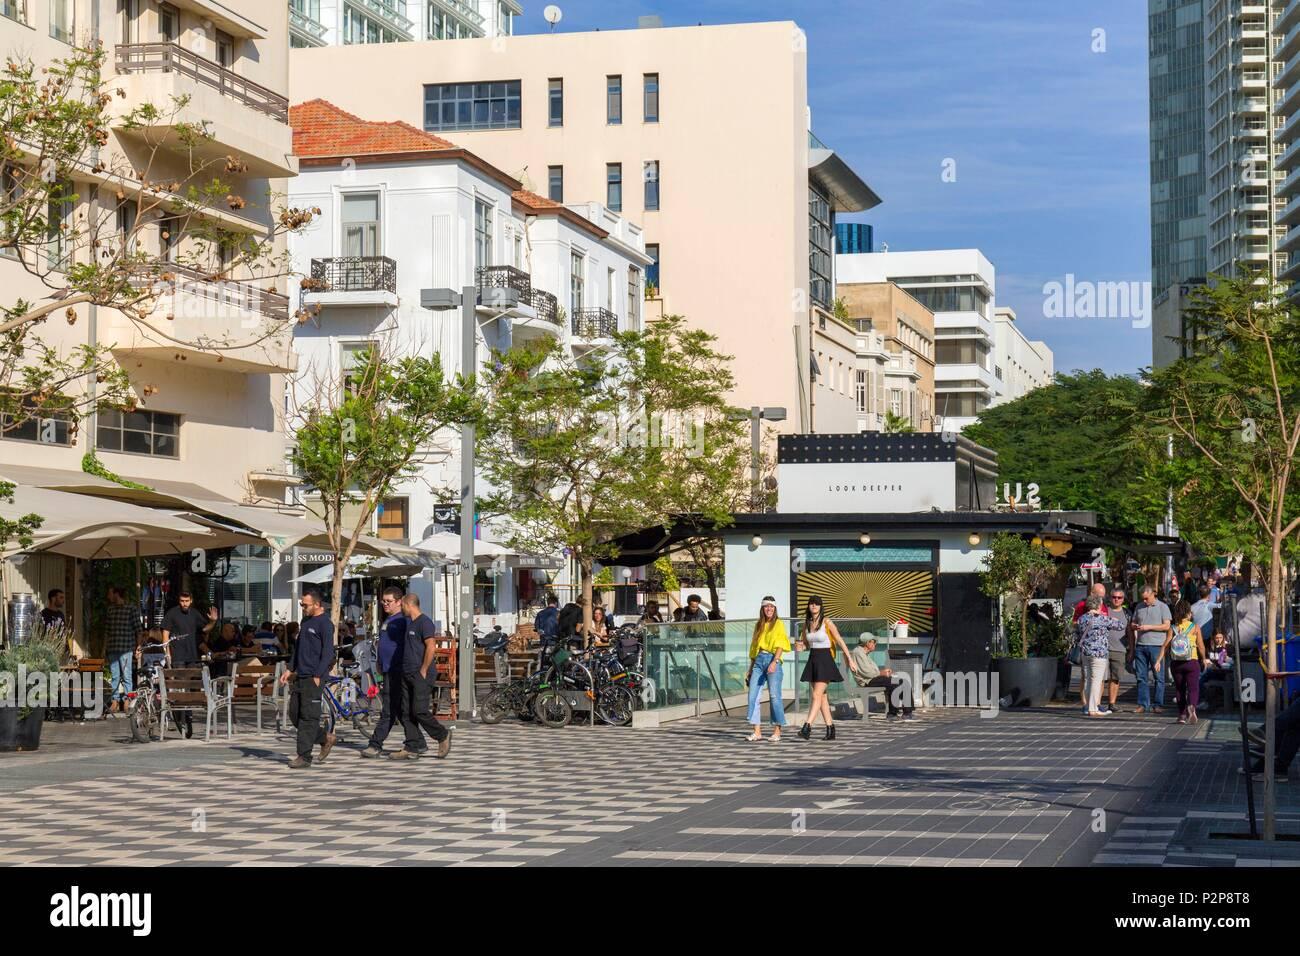 Israel, Tel Aviv, downtown, Sderot (boulevard) Rothschild, pedestrian area - Stock Image